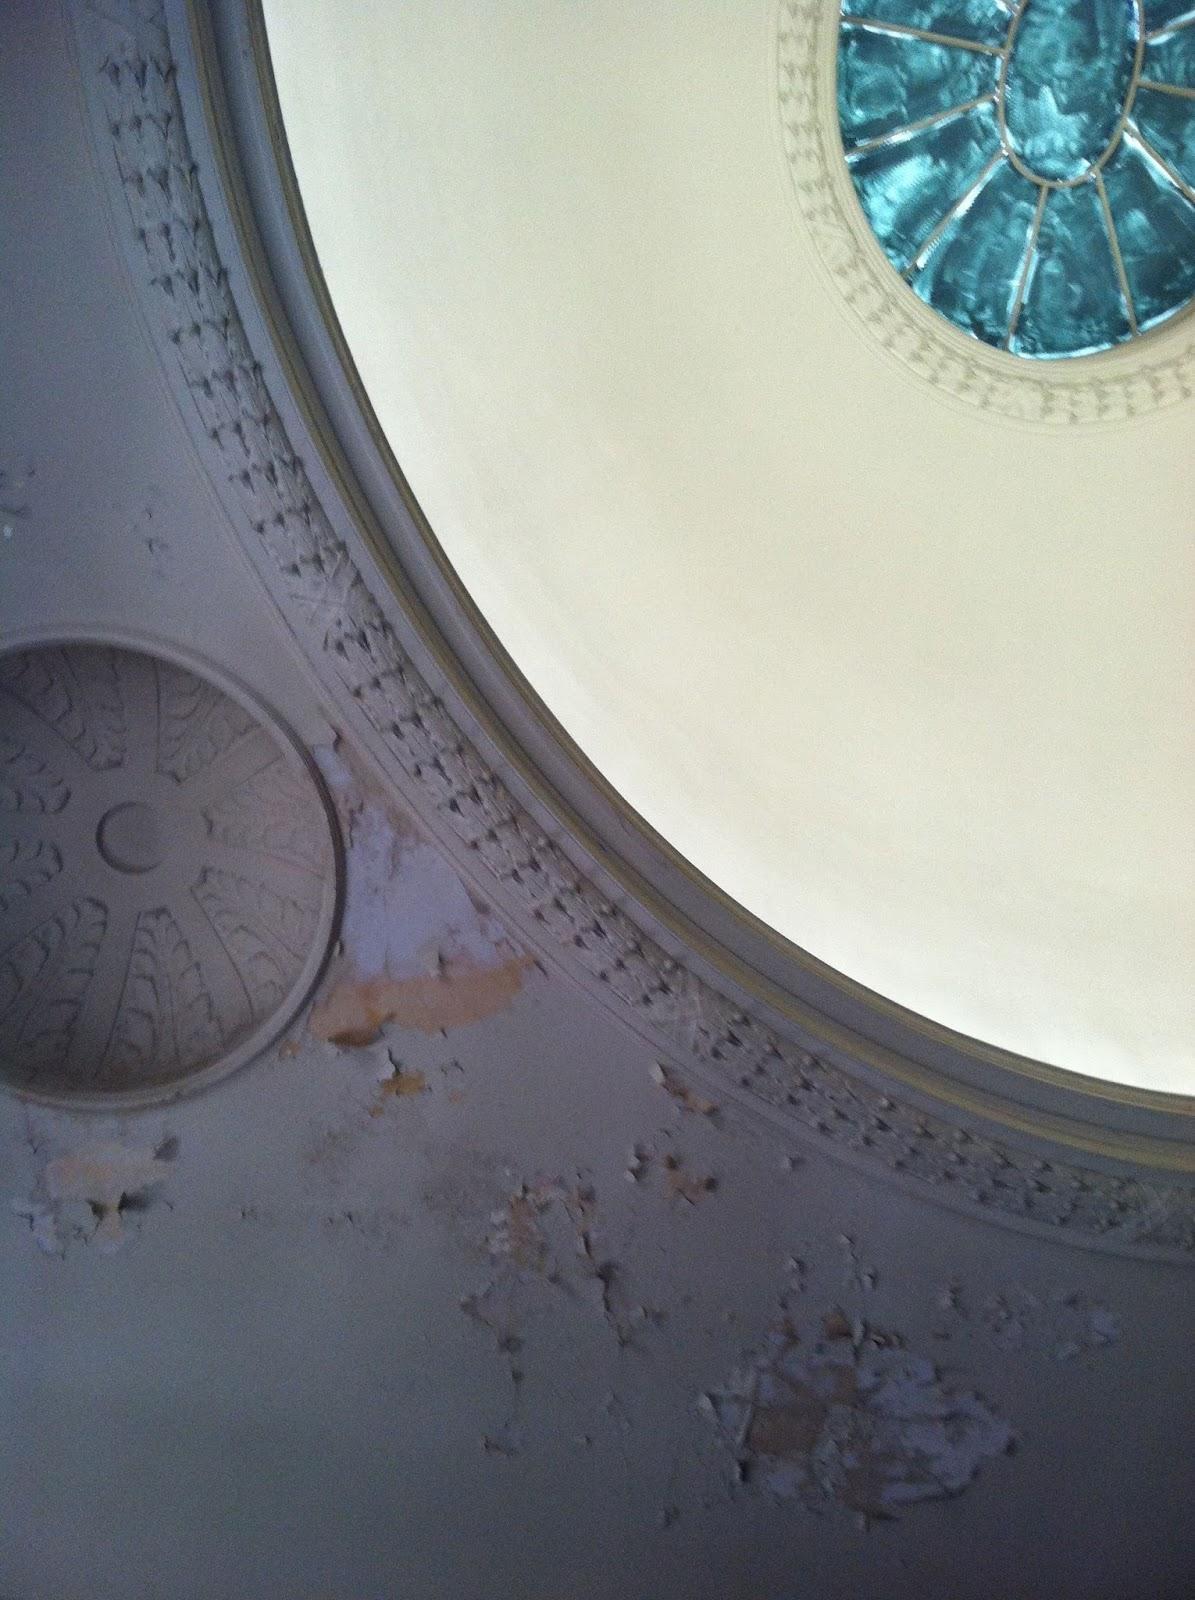 Boston Public Library peeling paint